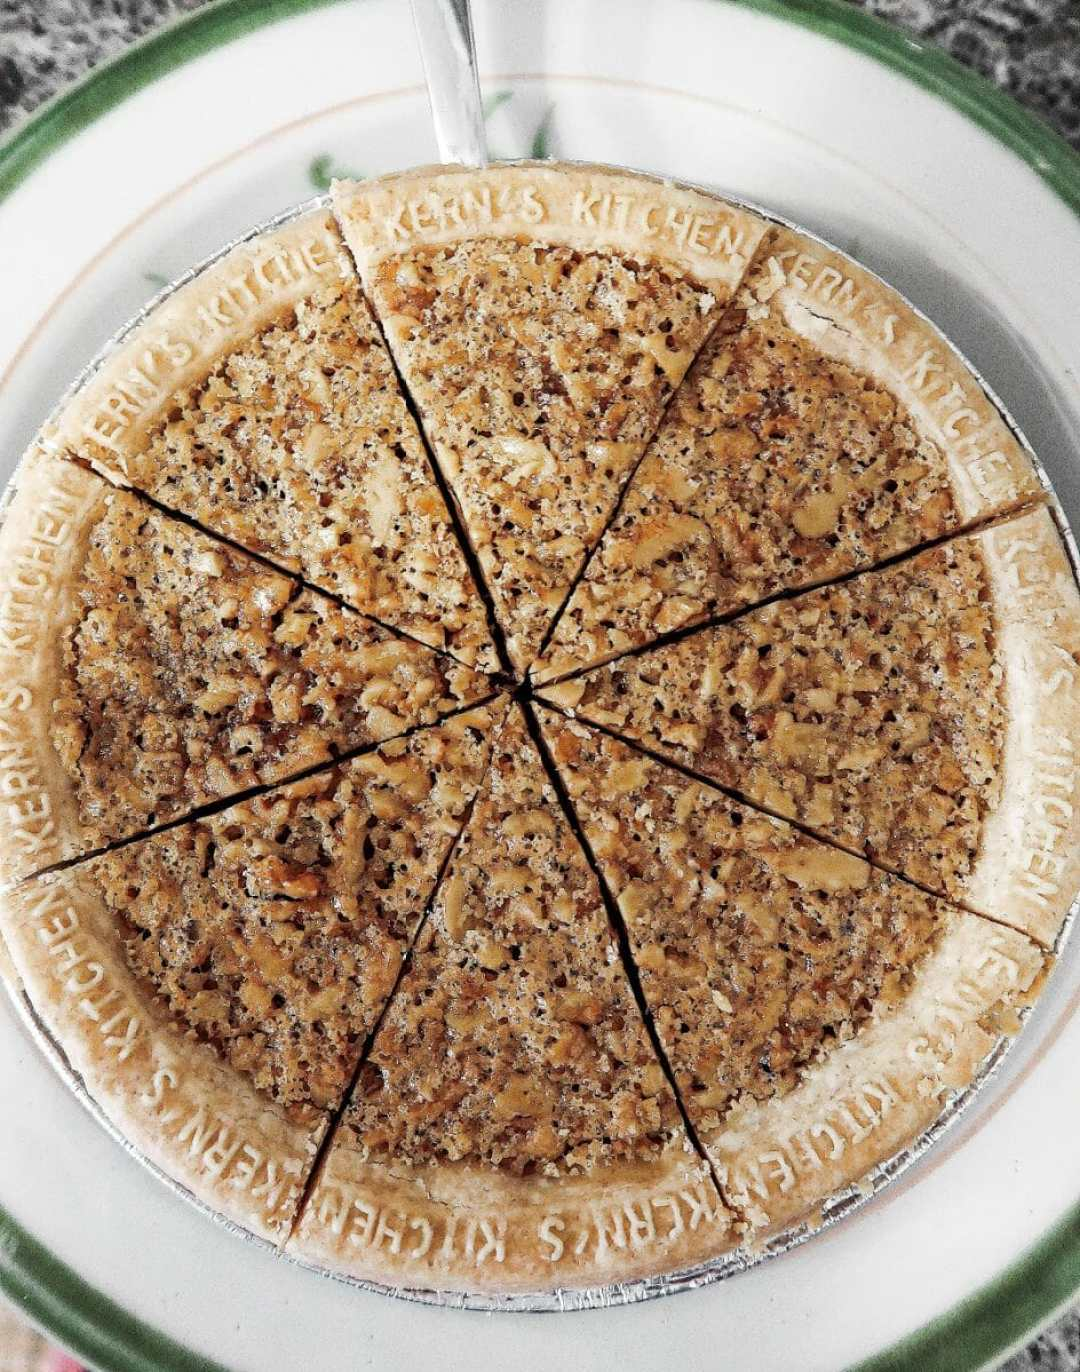 Kentucky Derby Party Derby Pie Kern's Kitchen-- JCP Eats